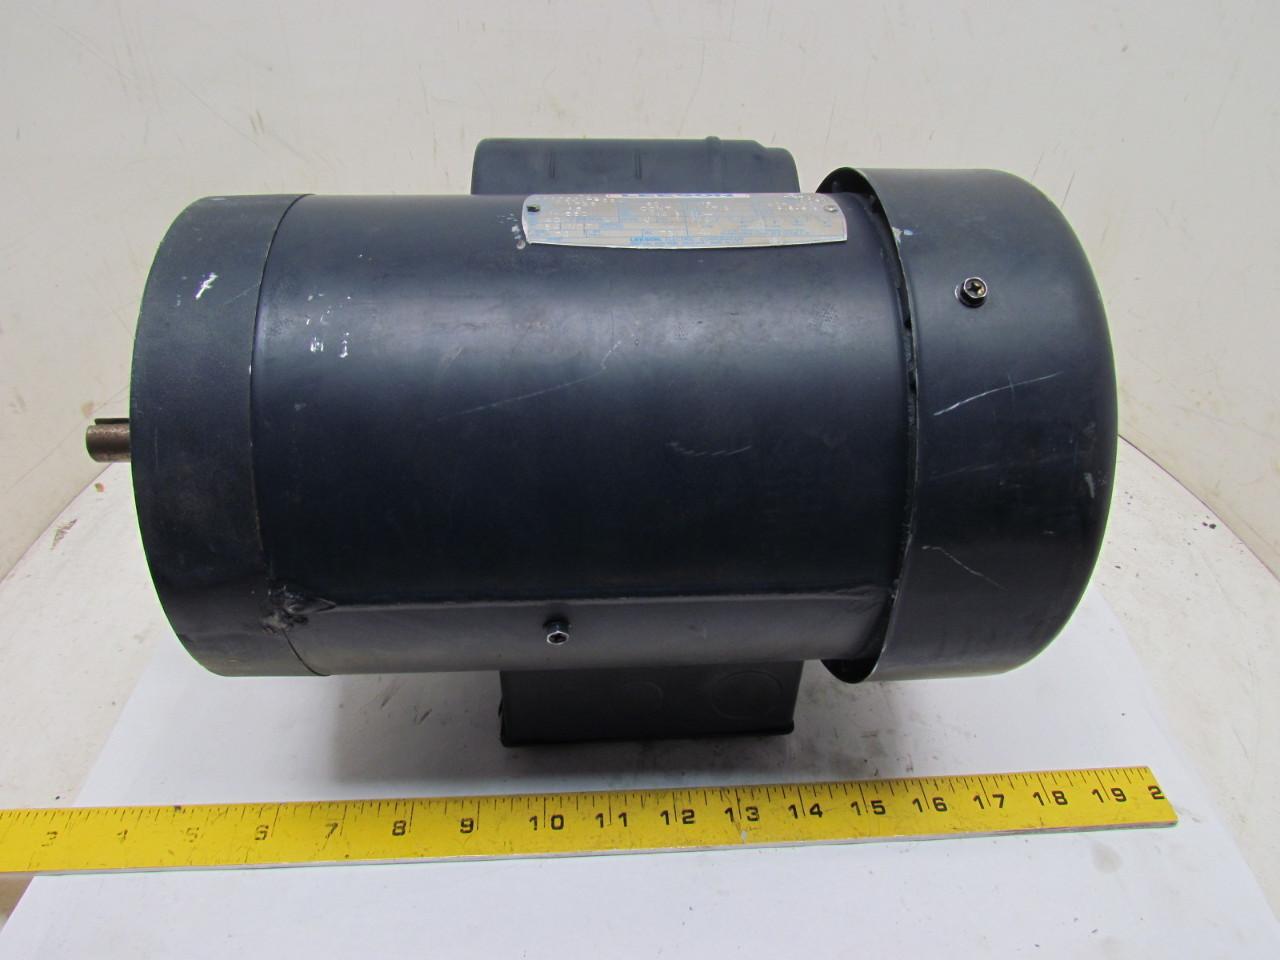 Leeson c6k17fc2j 1ph single phase electric motor 1 5hp for 15 hp single phase motor